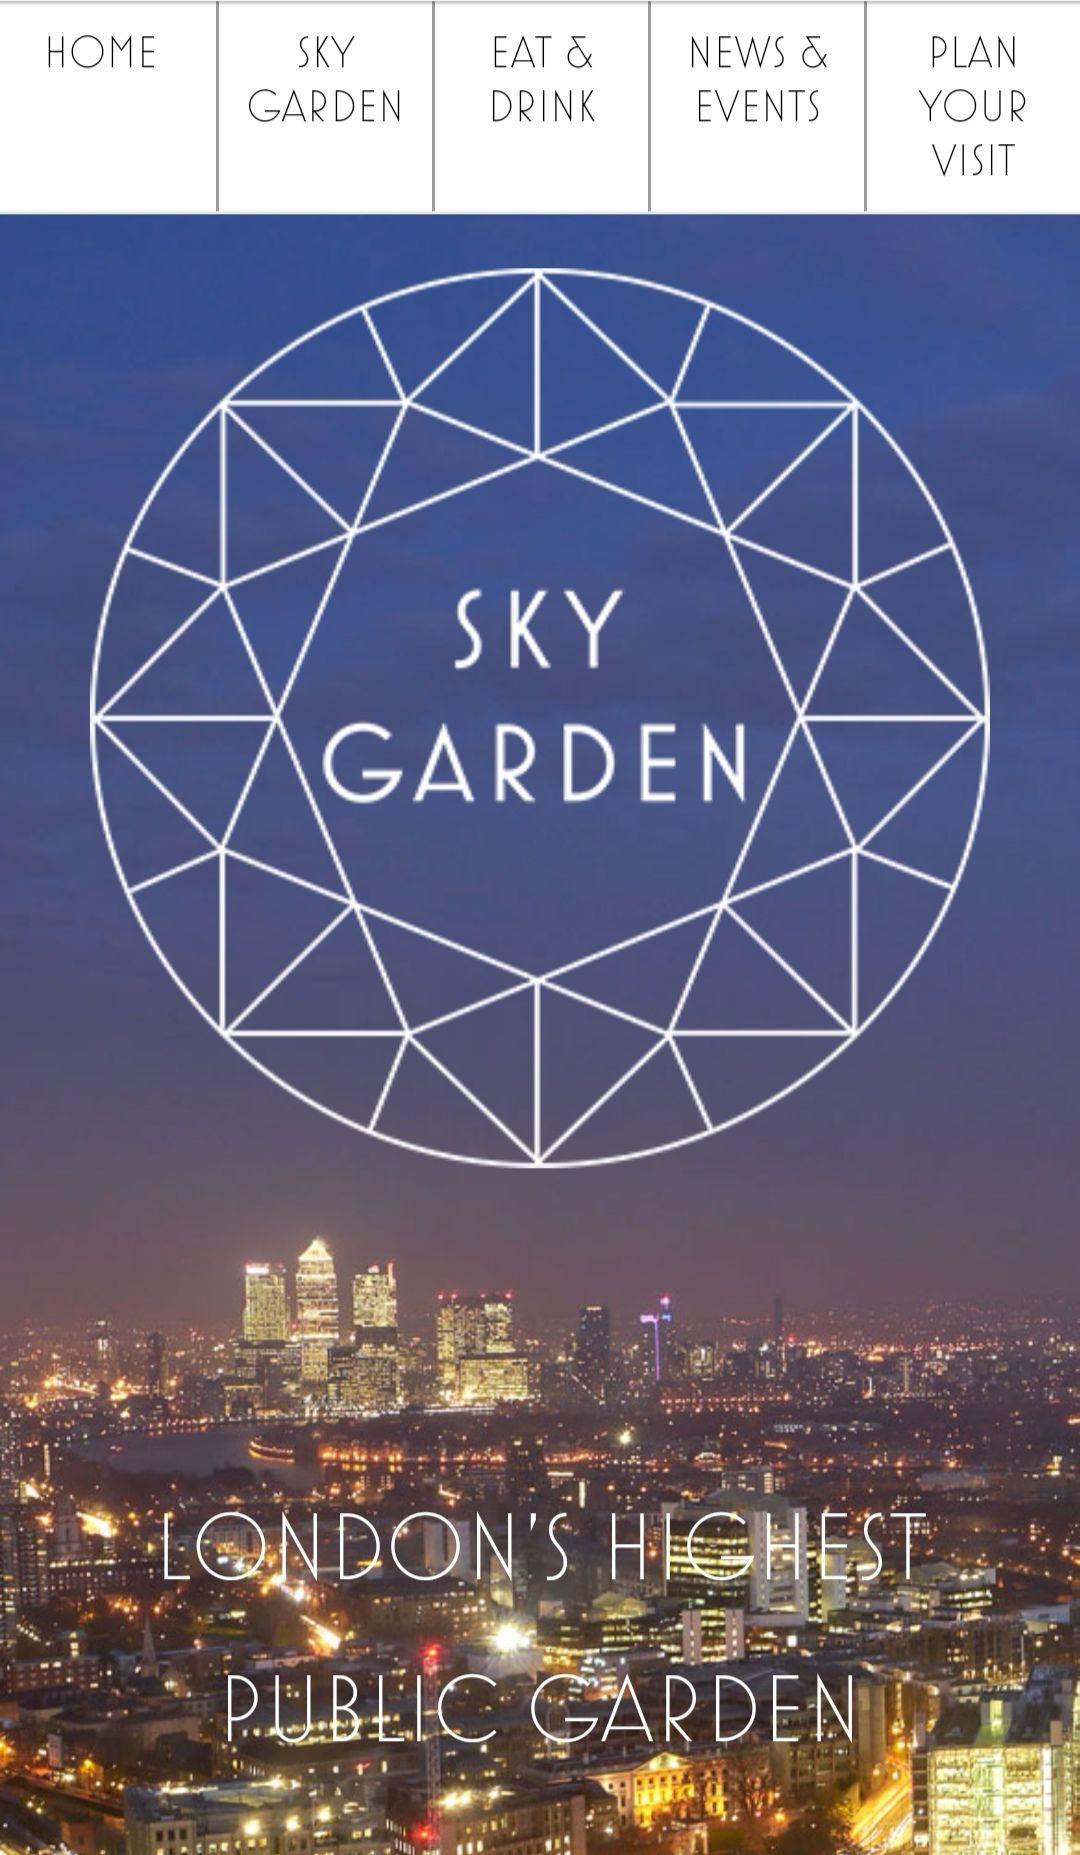 Free access to London's Sky Garden